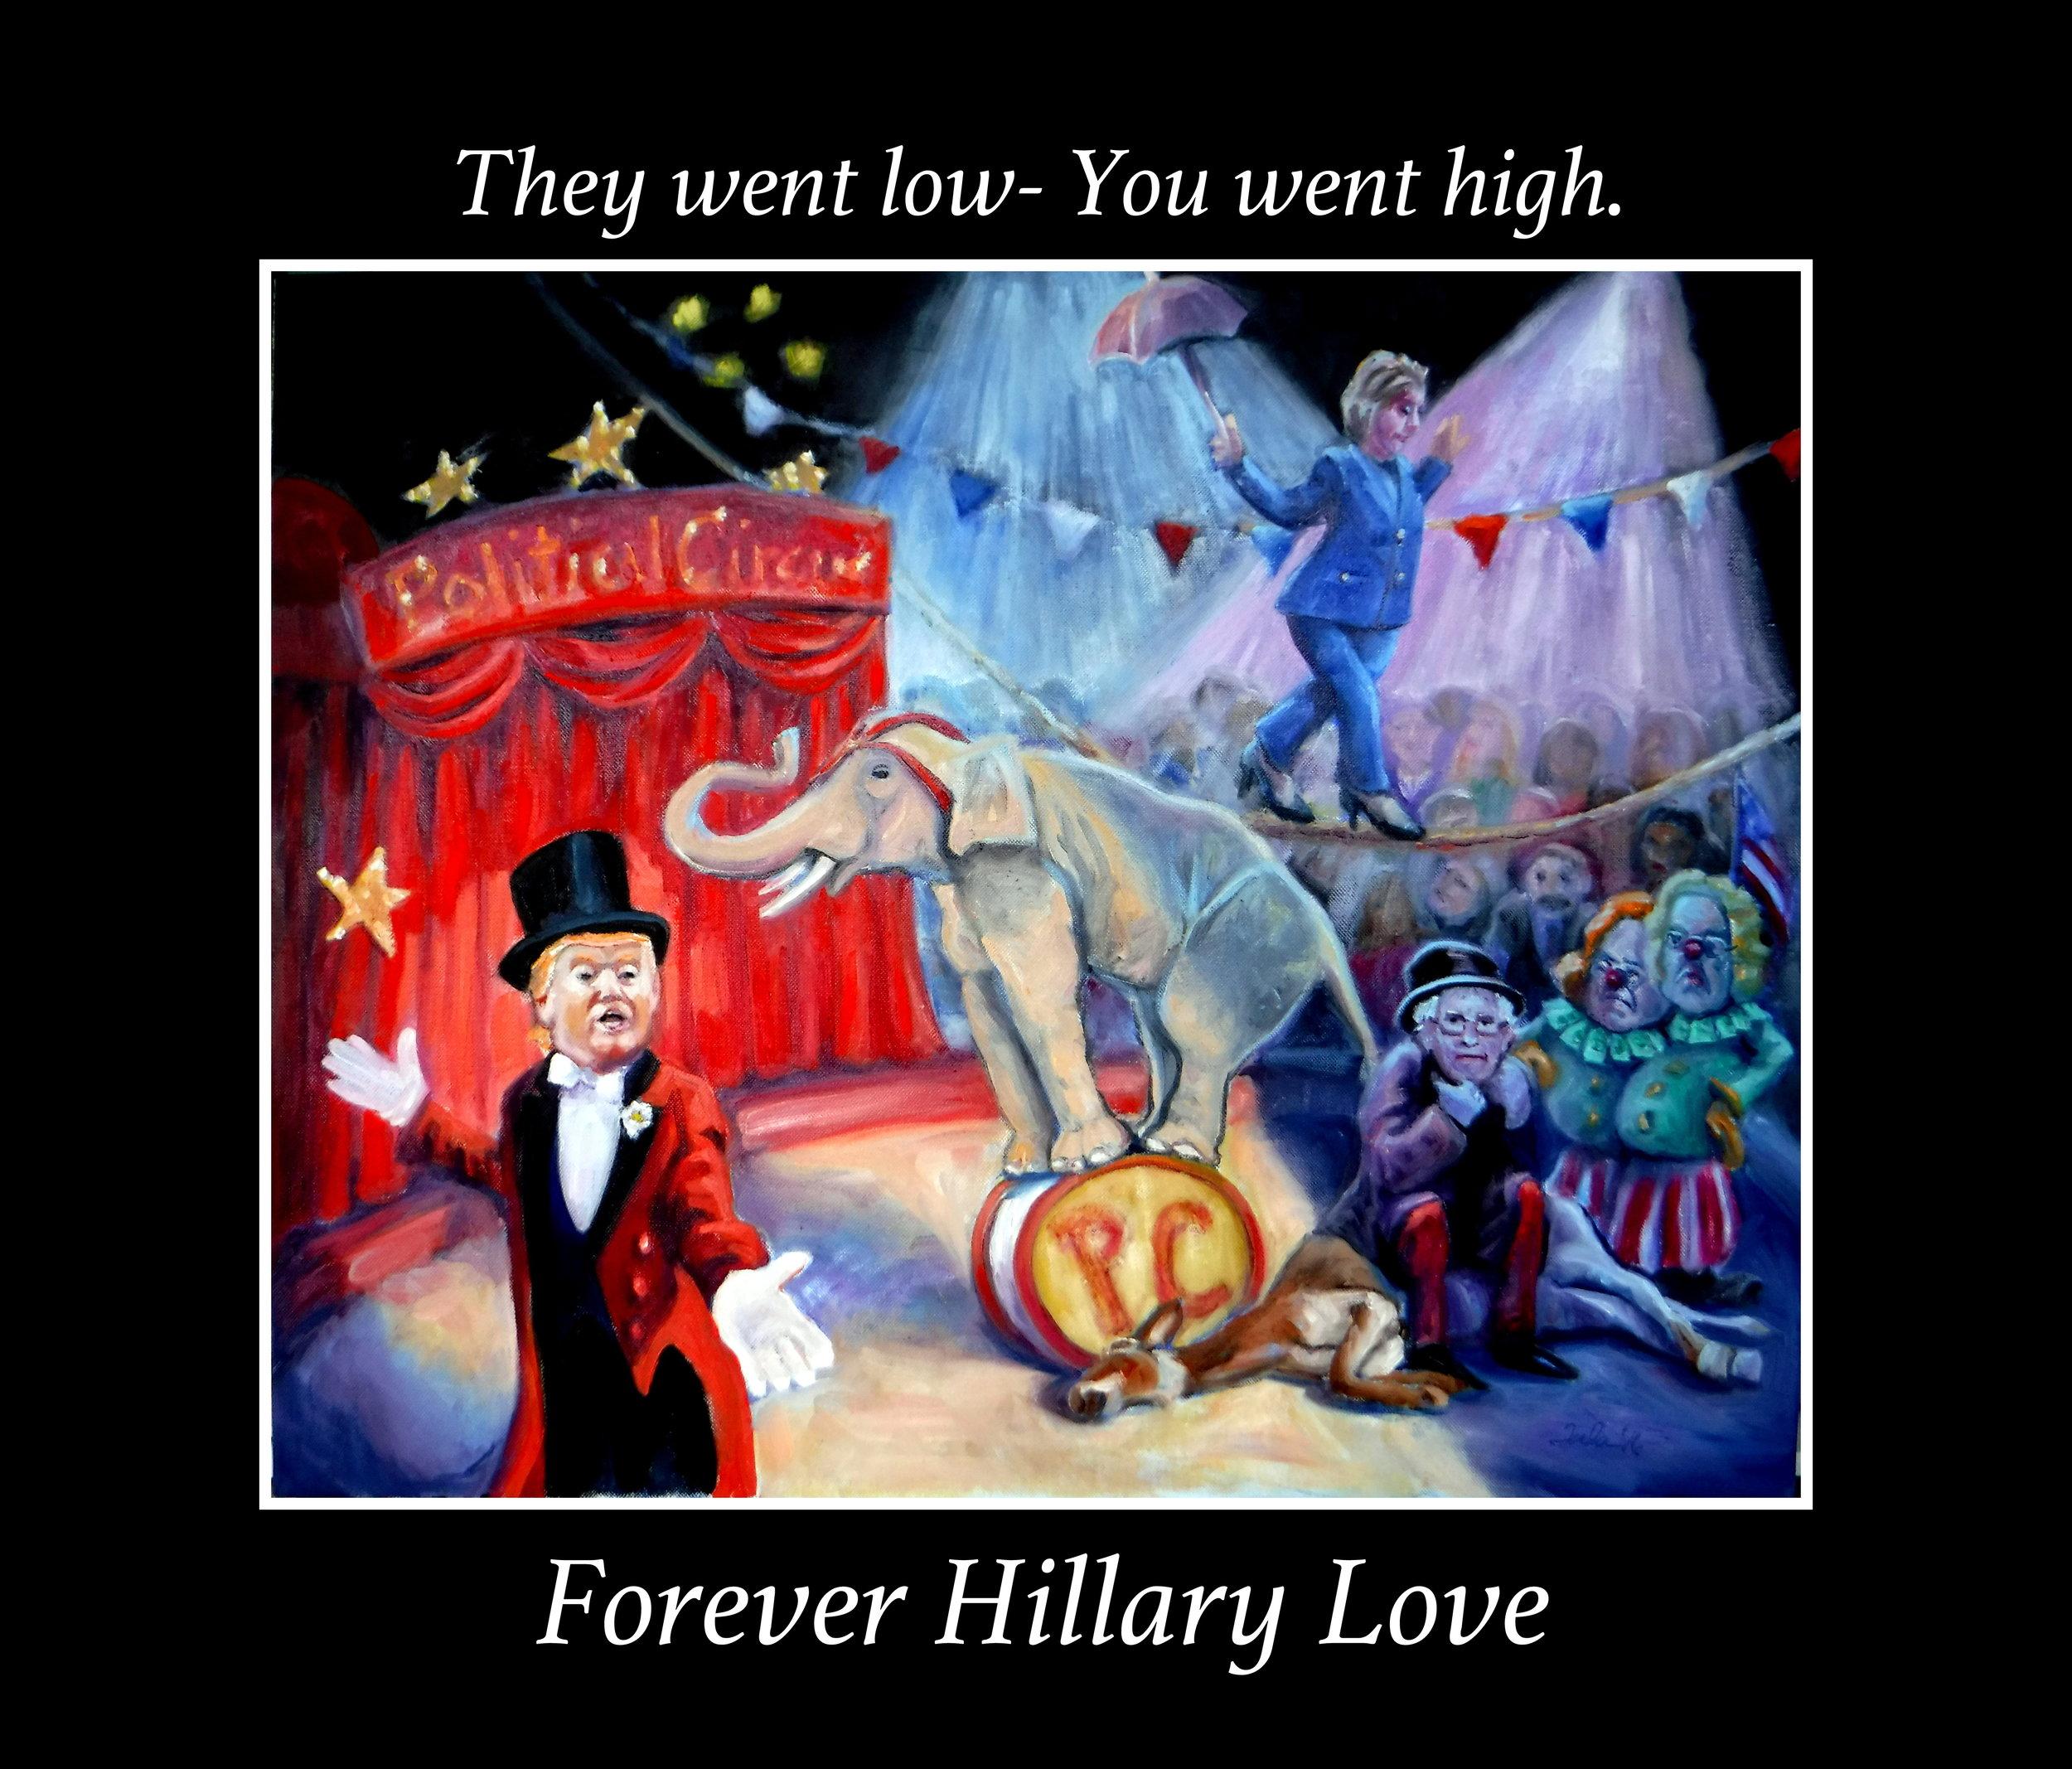 Forever Hillary Love- Copyright 2016